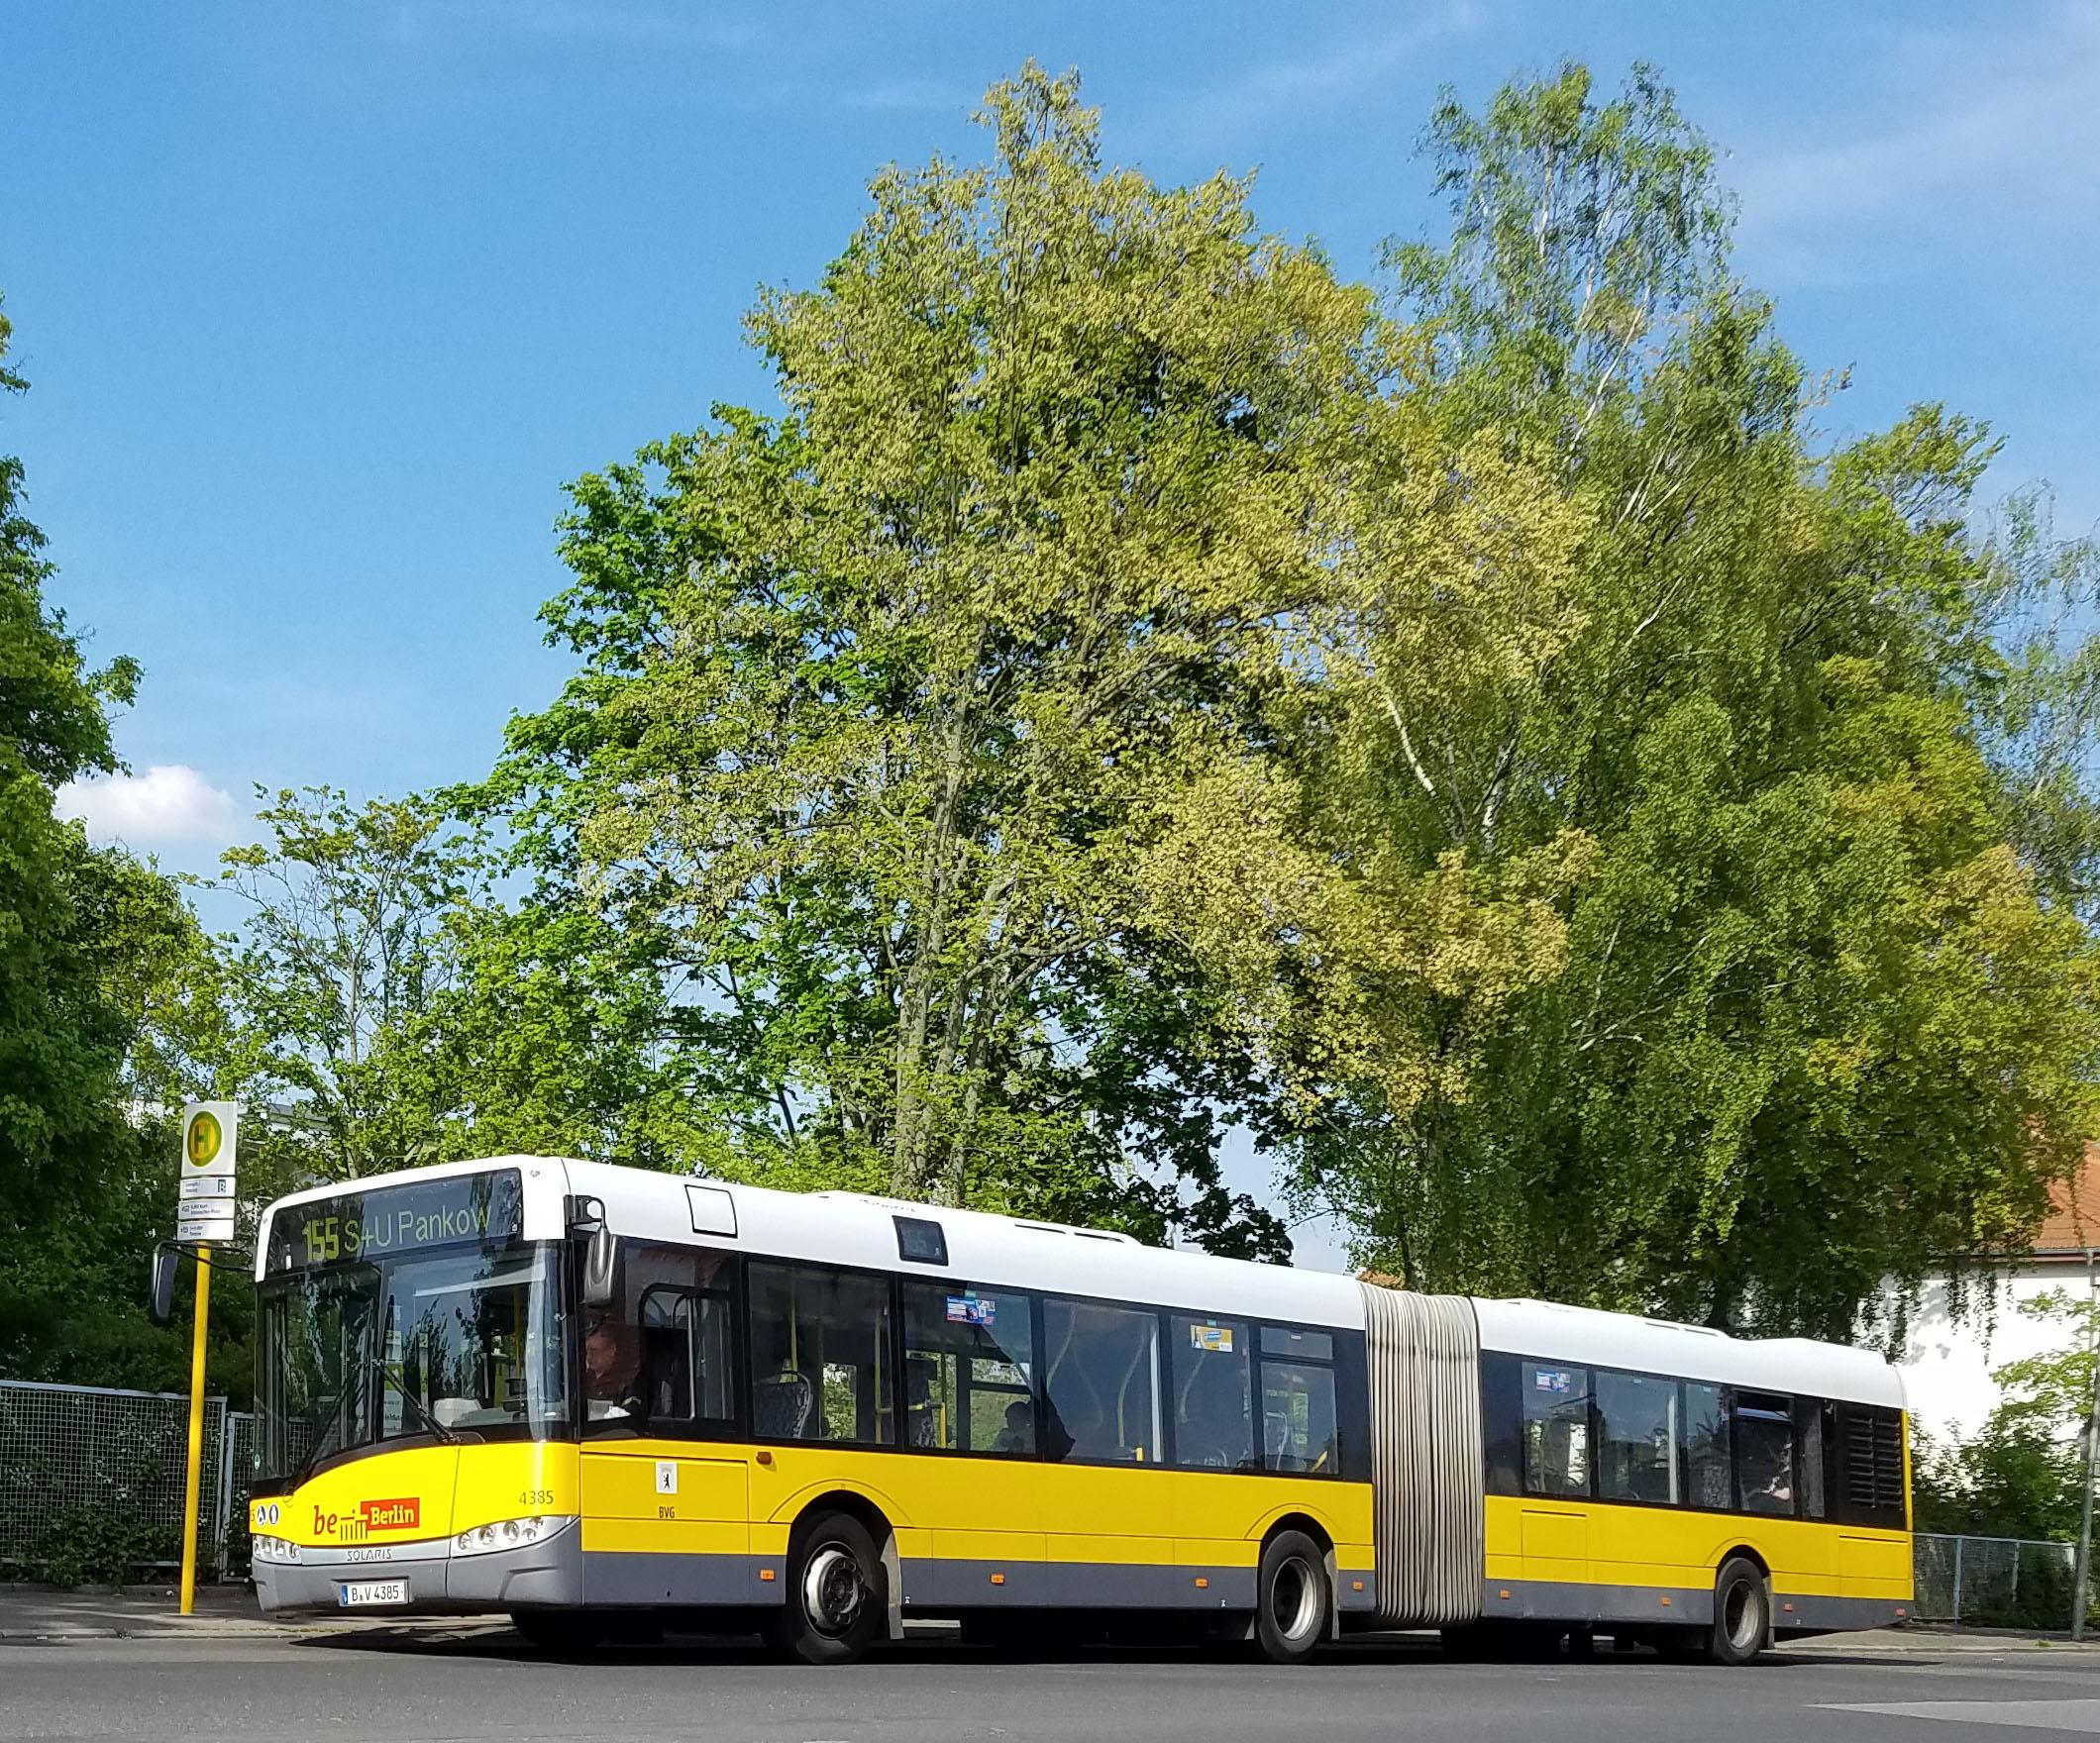 Foto: Bus 4385, Typ Solaris Urbino 18, Wilhelmsruh, Mai 2017